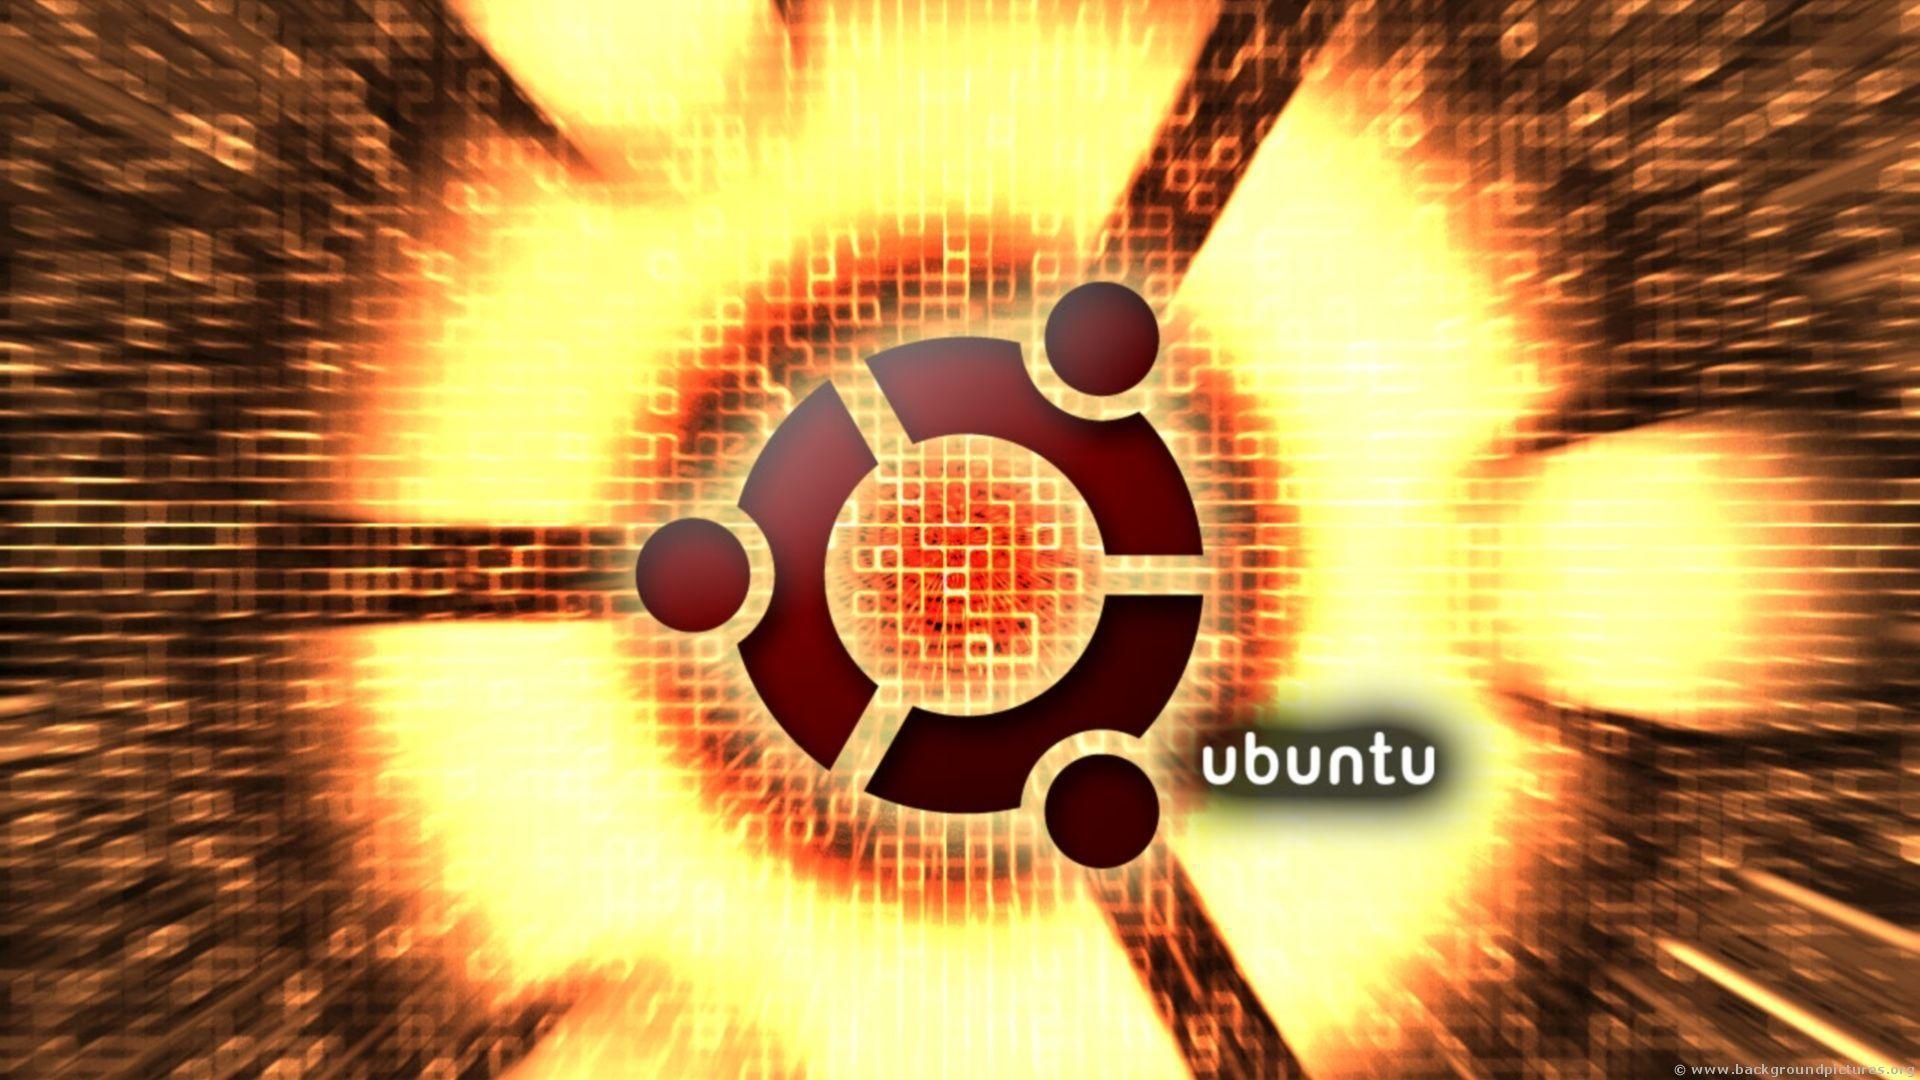 Ubuntu Dragon Wallpapers 1920x1080